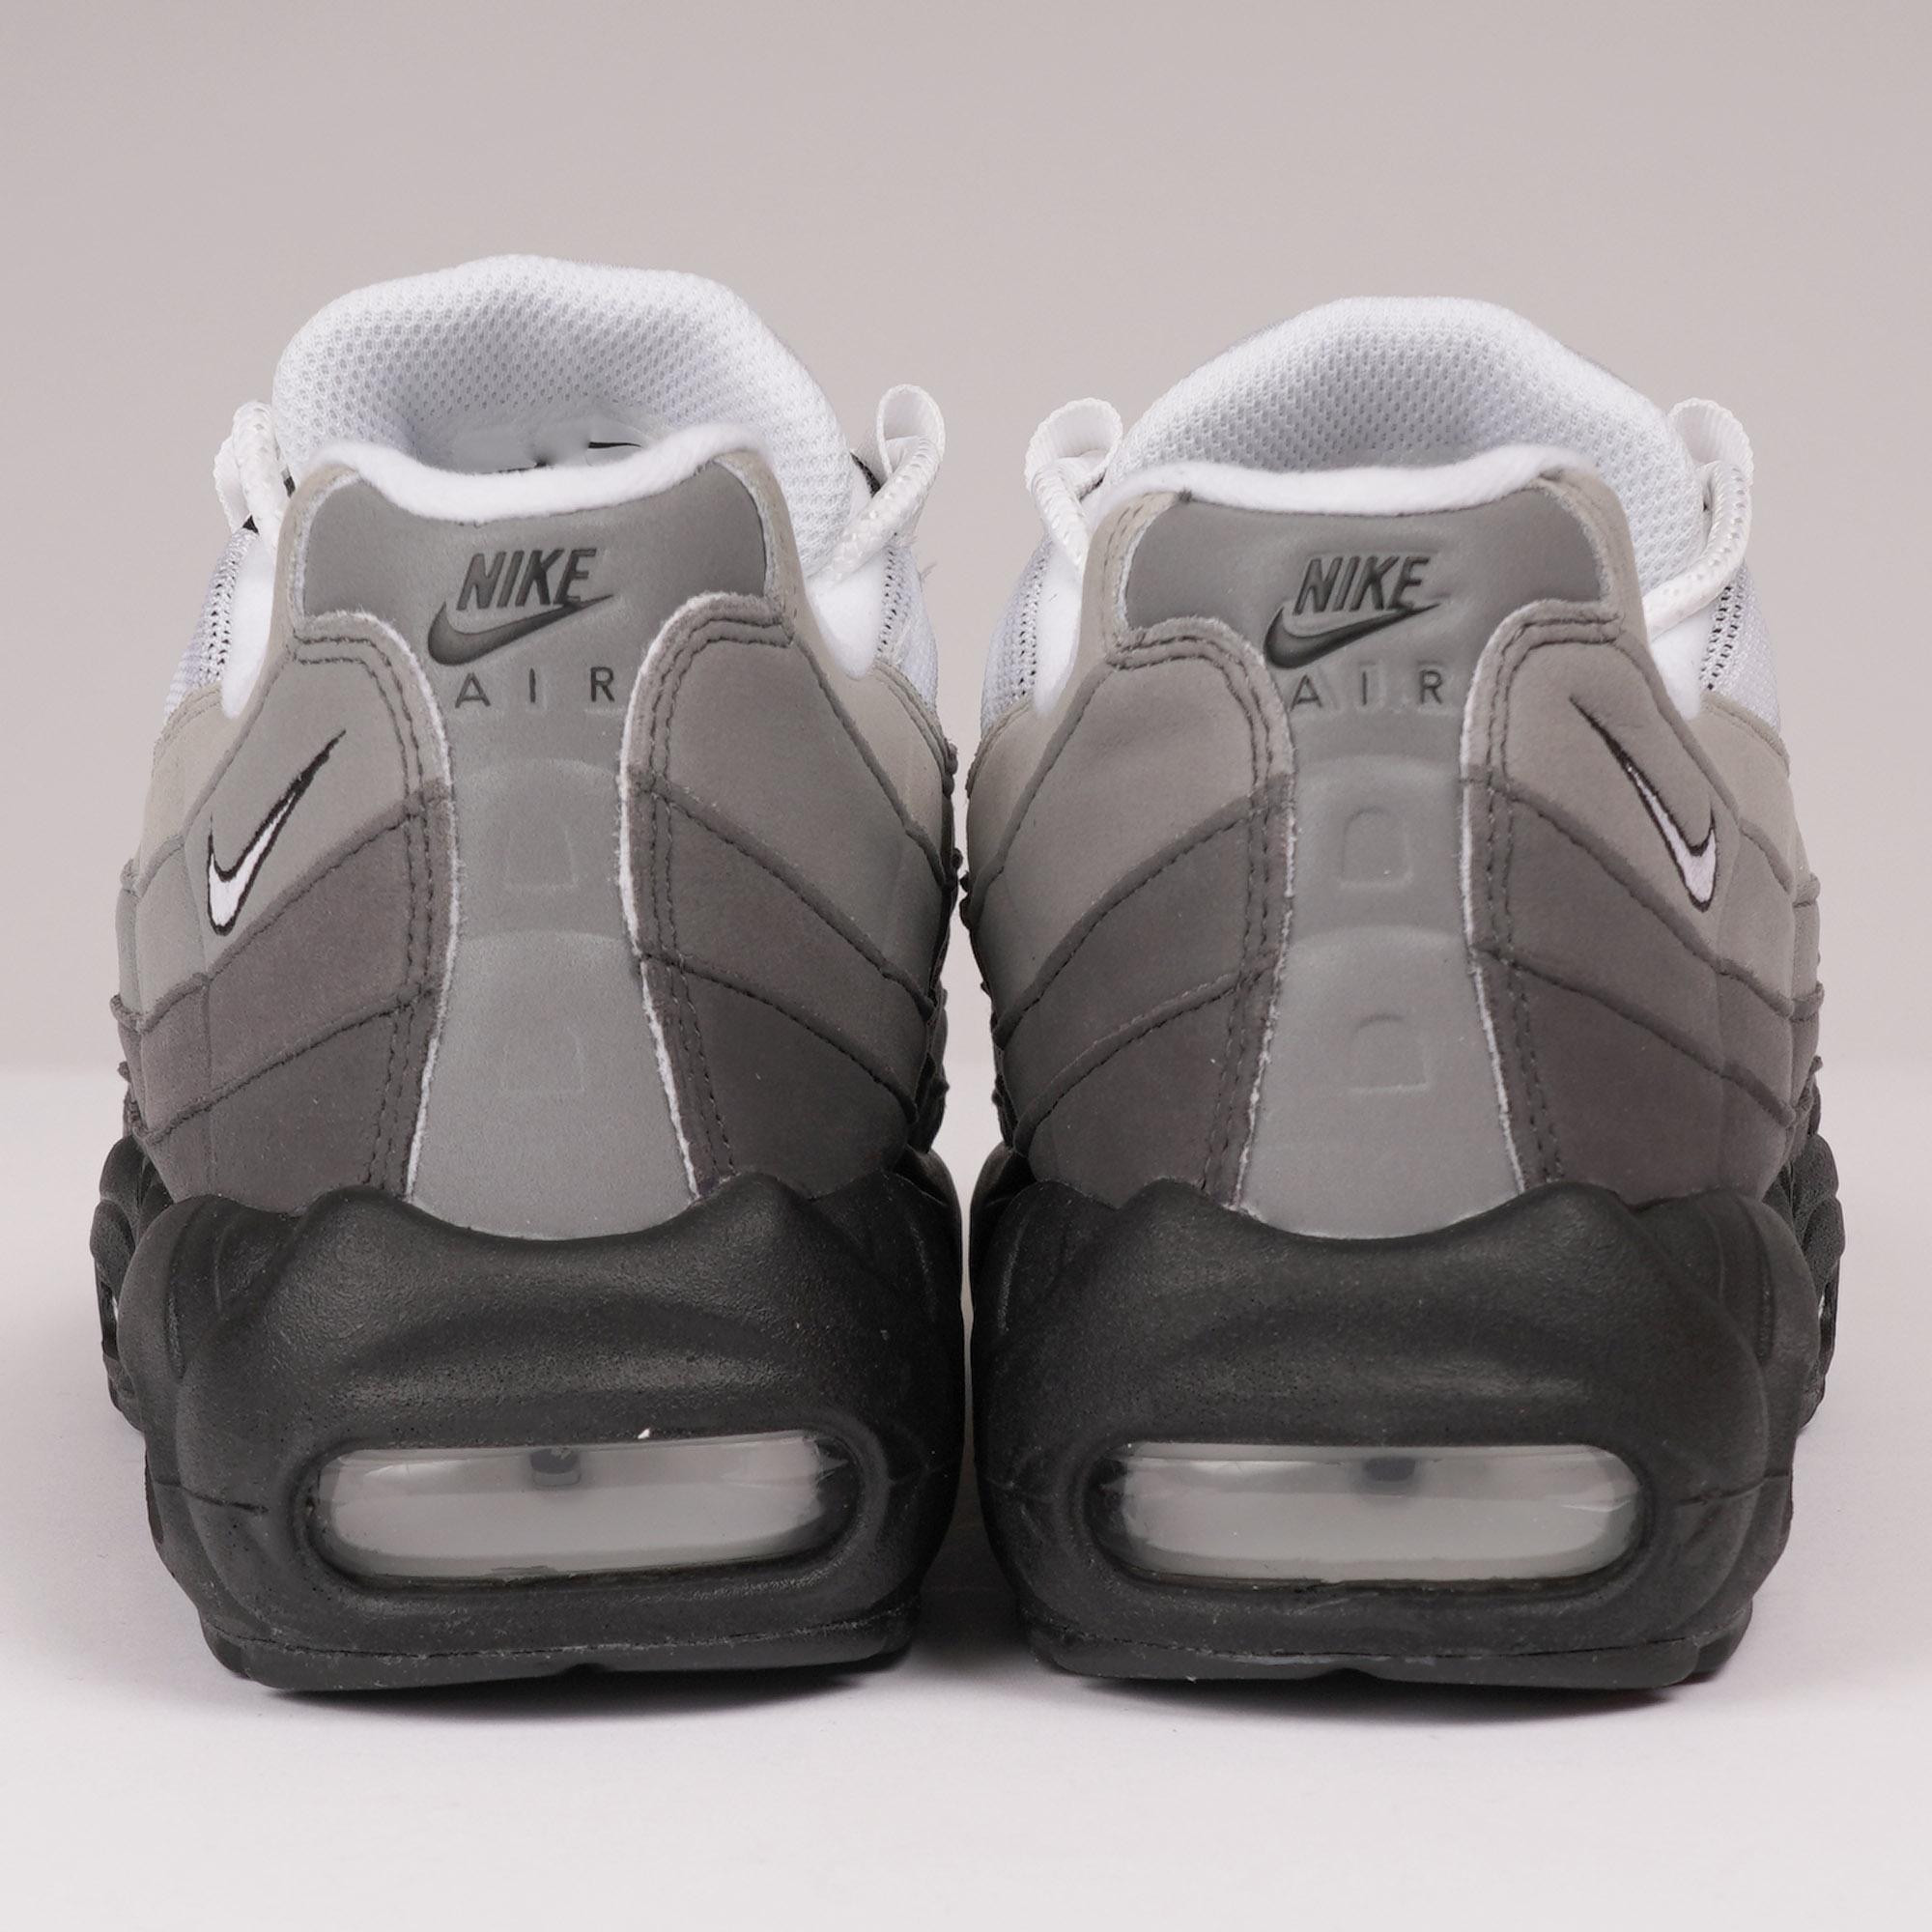 57376f51d Nike Air Max 95 Og - Black